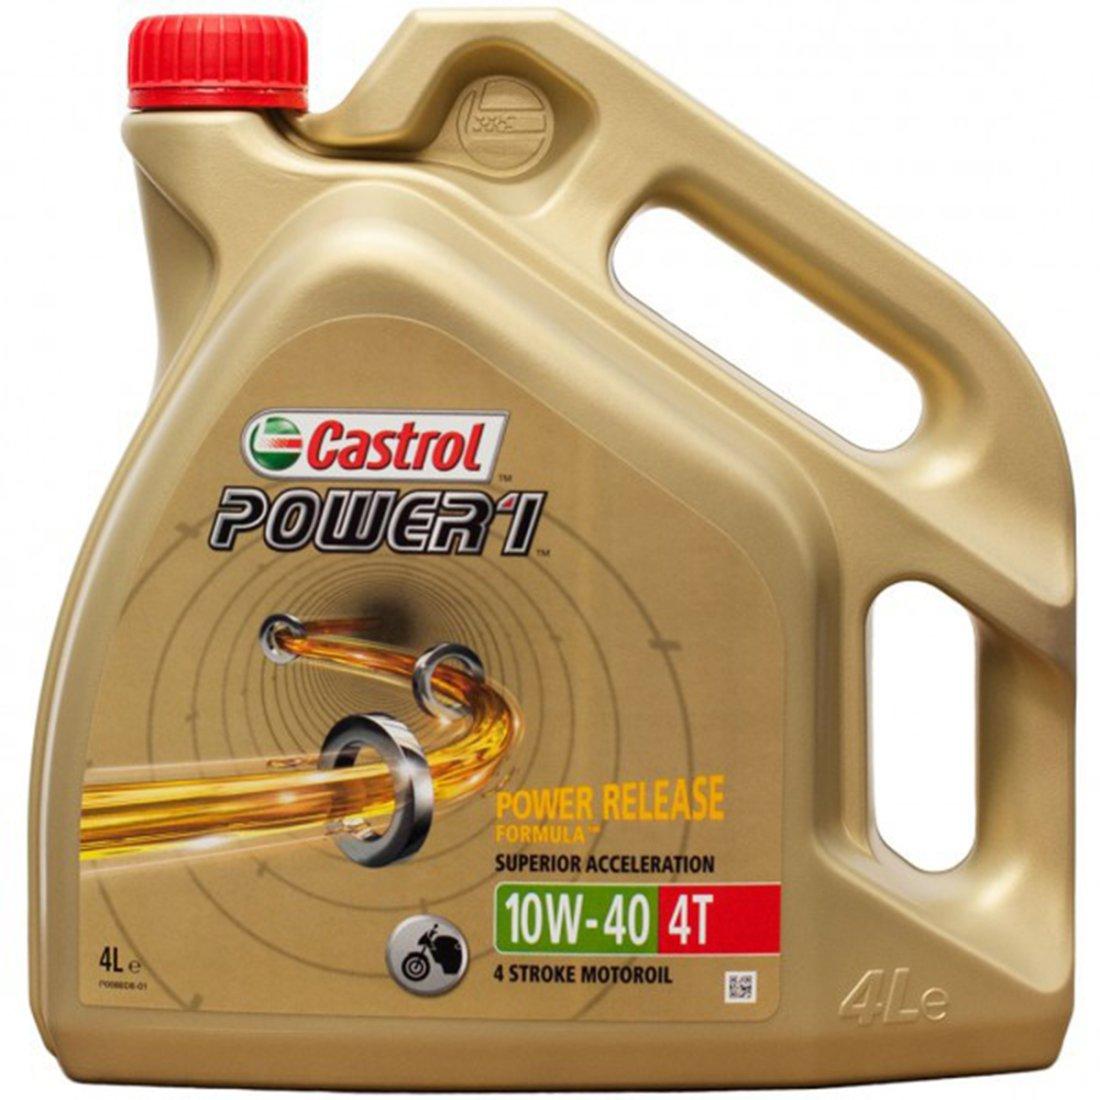 null CASTROL Power 1 4T 4L 10W-40